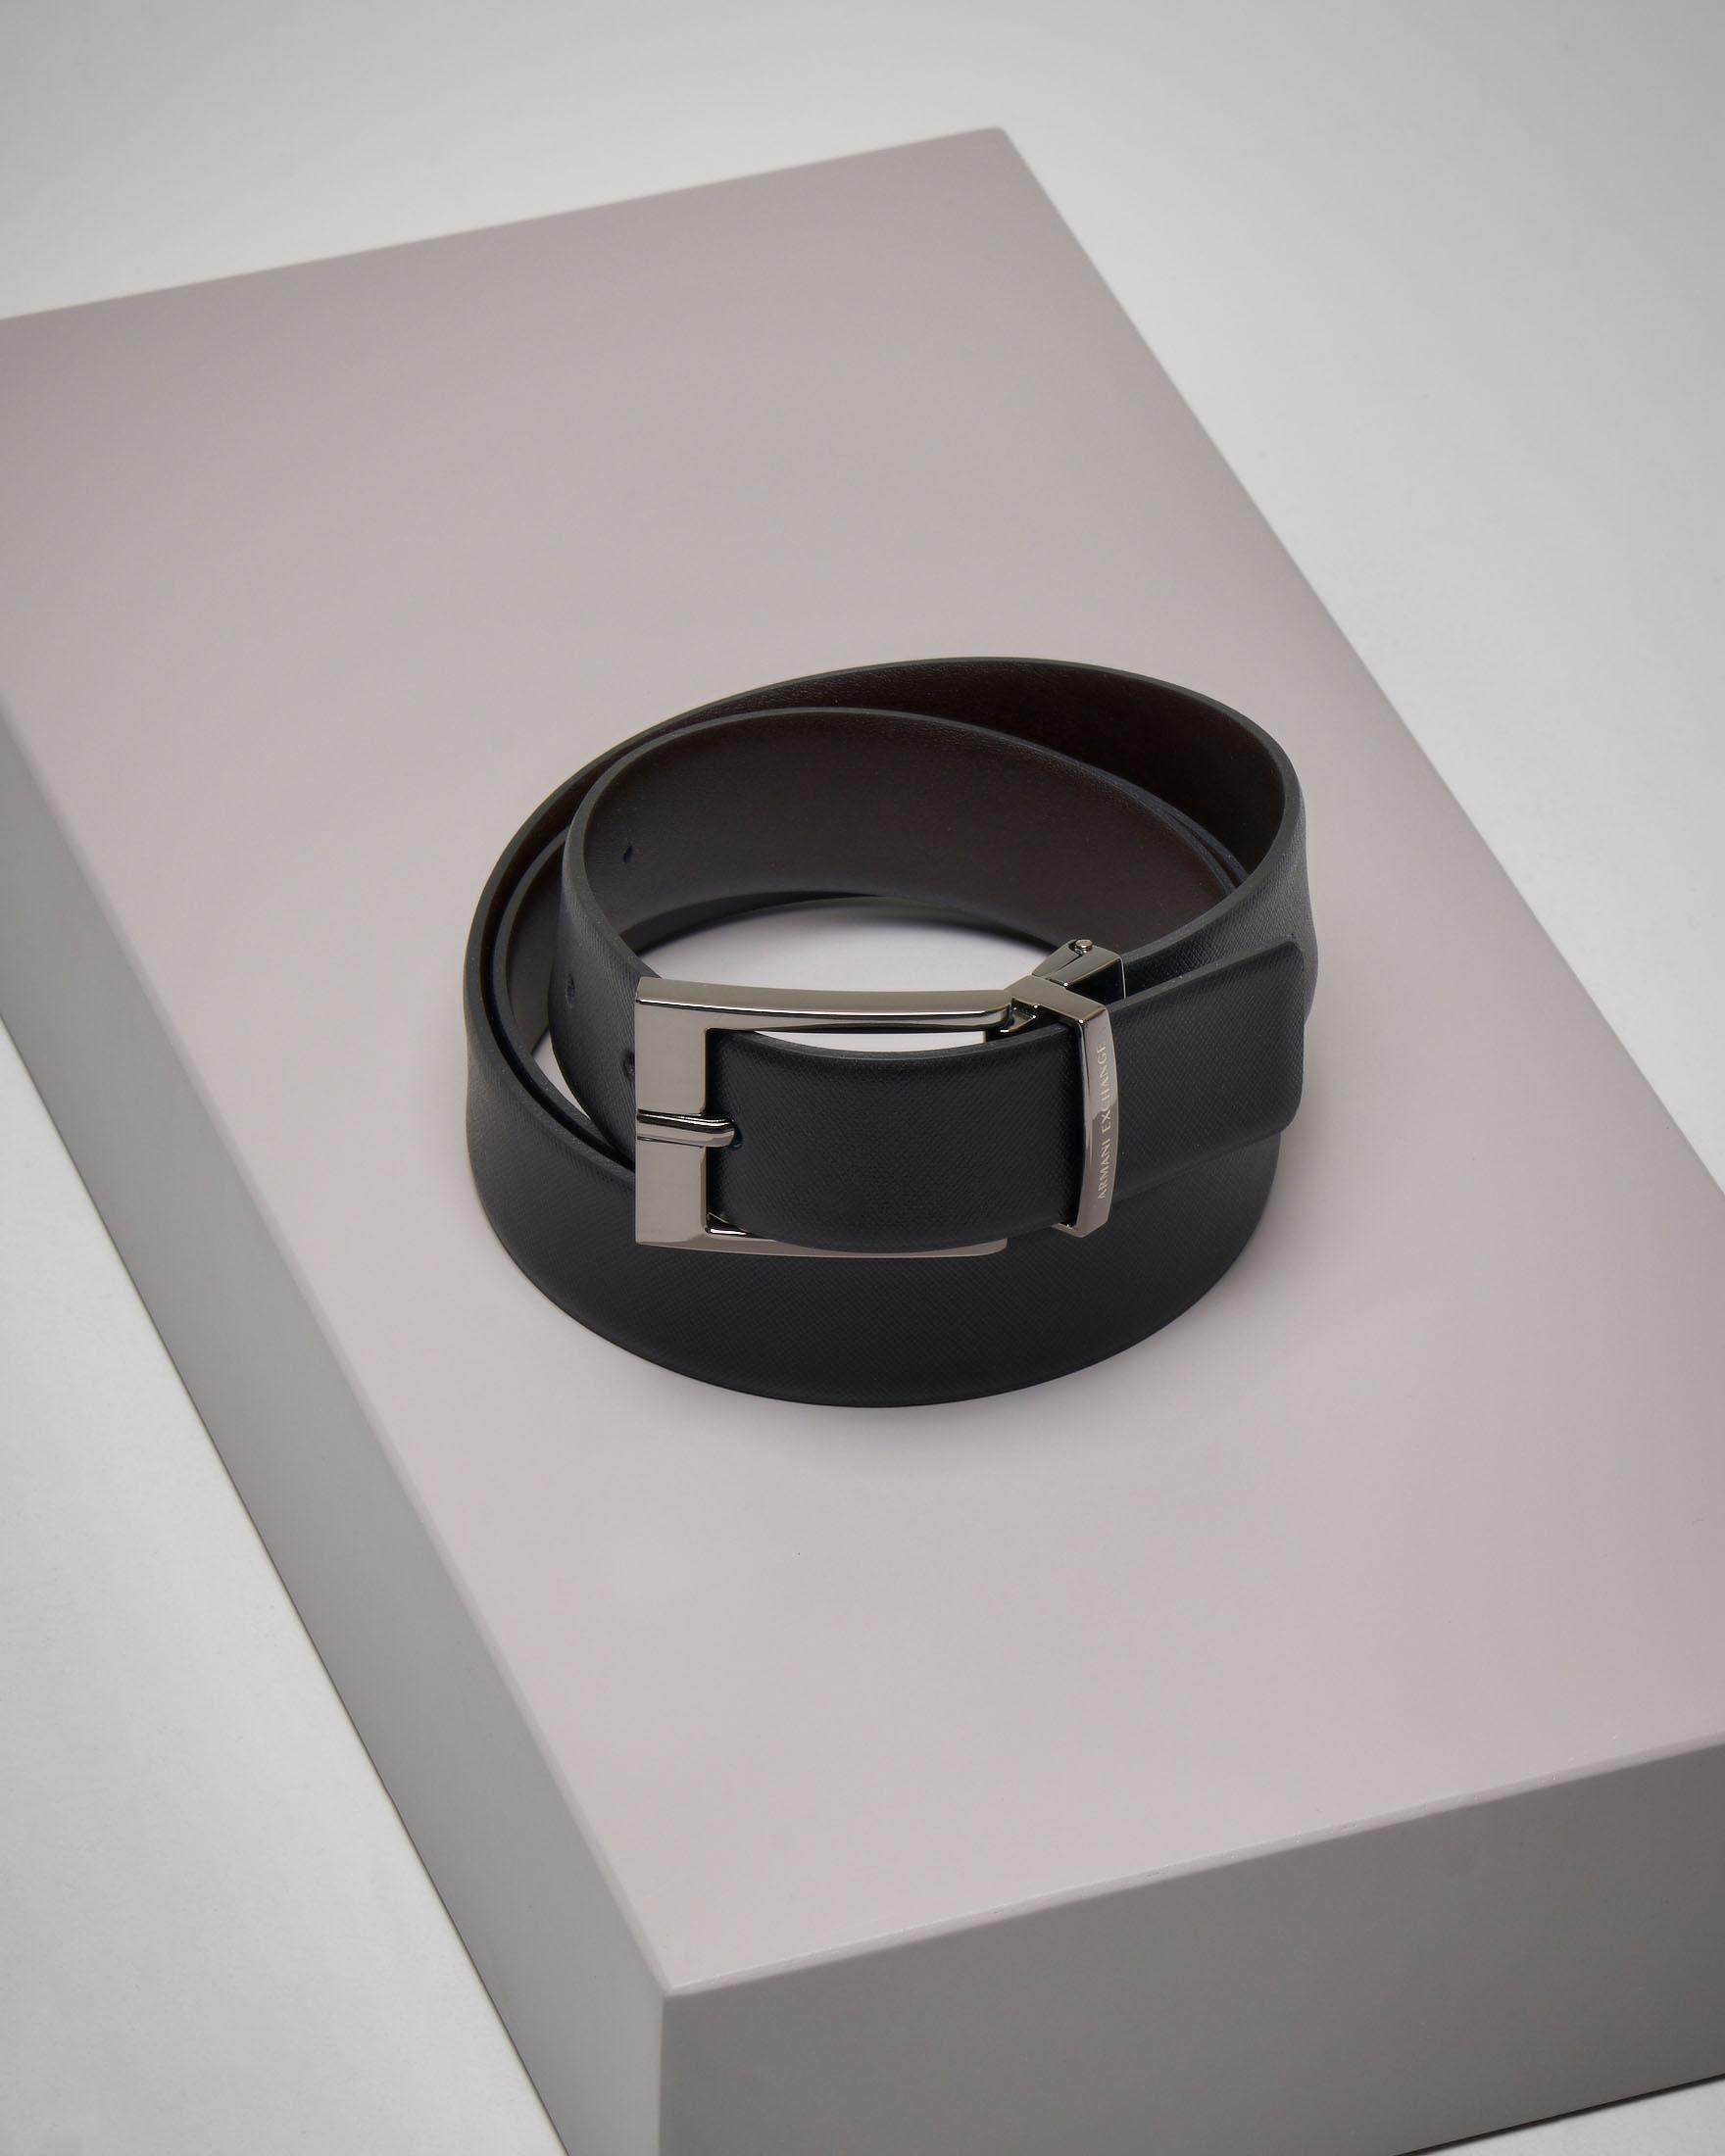 Cintura reversibile in pelle saffiano